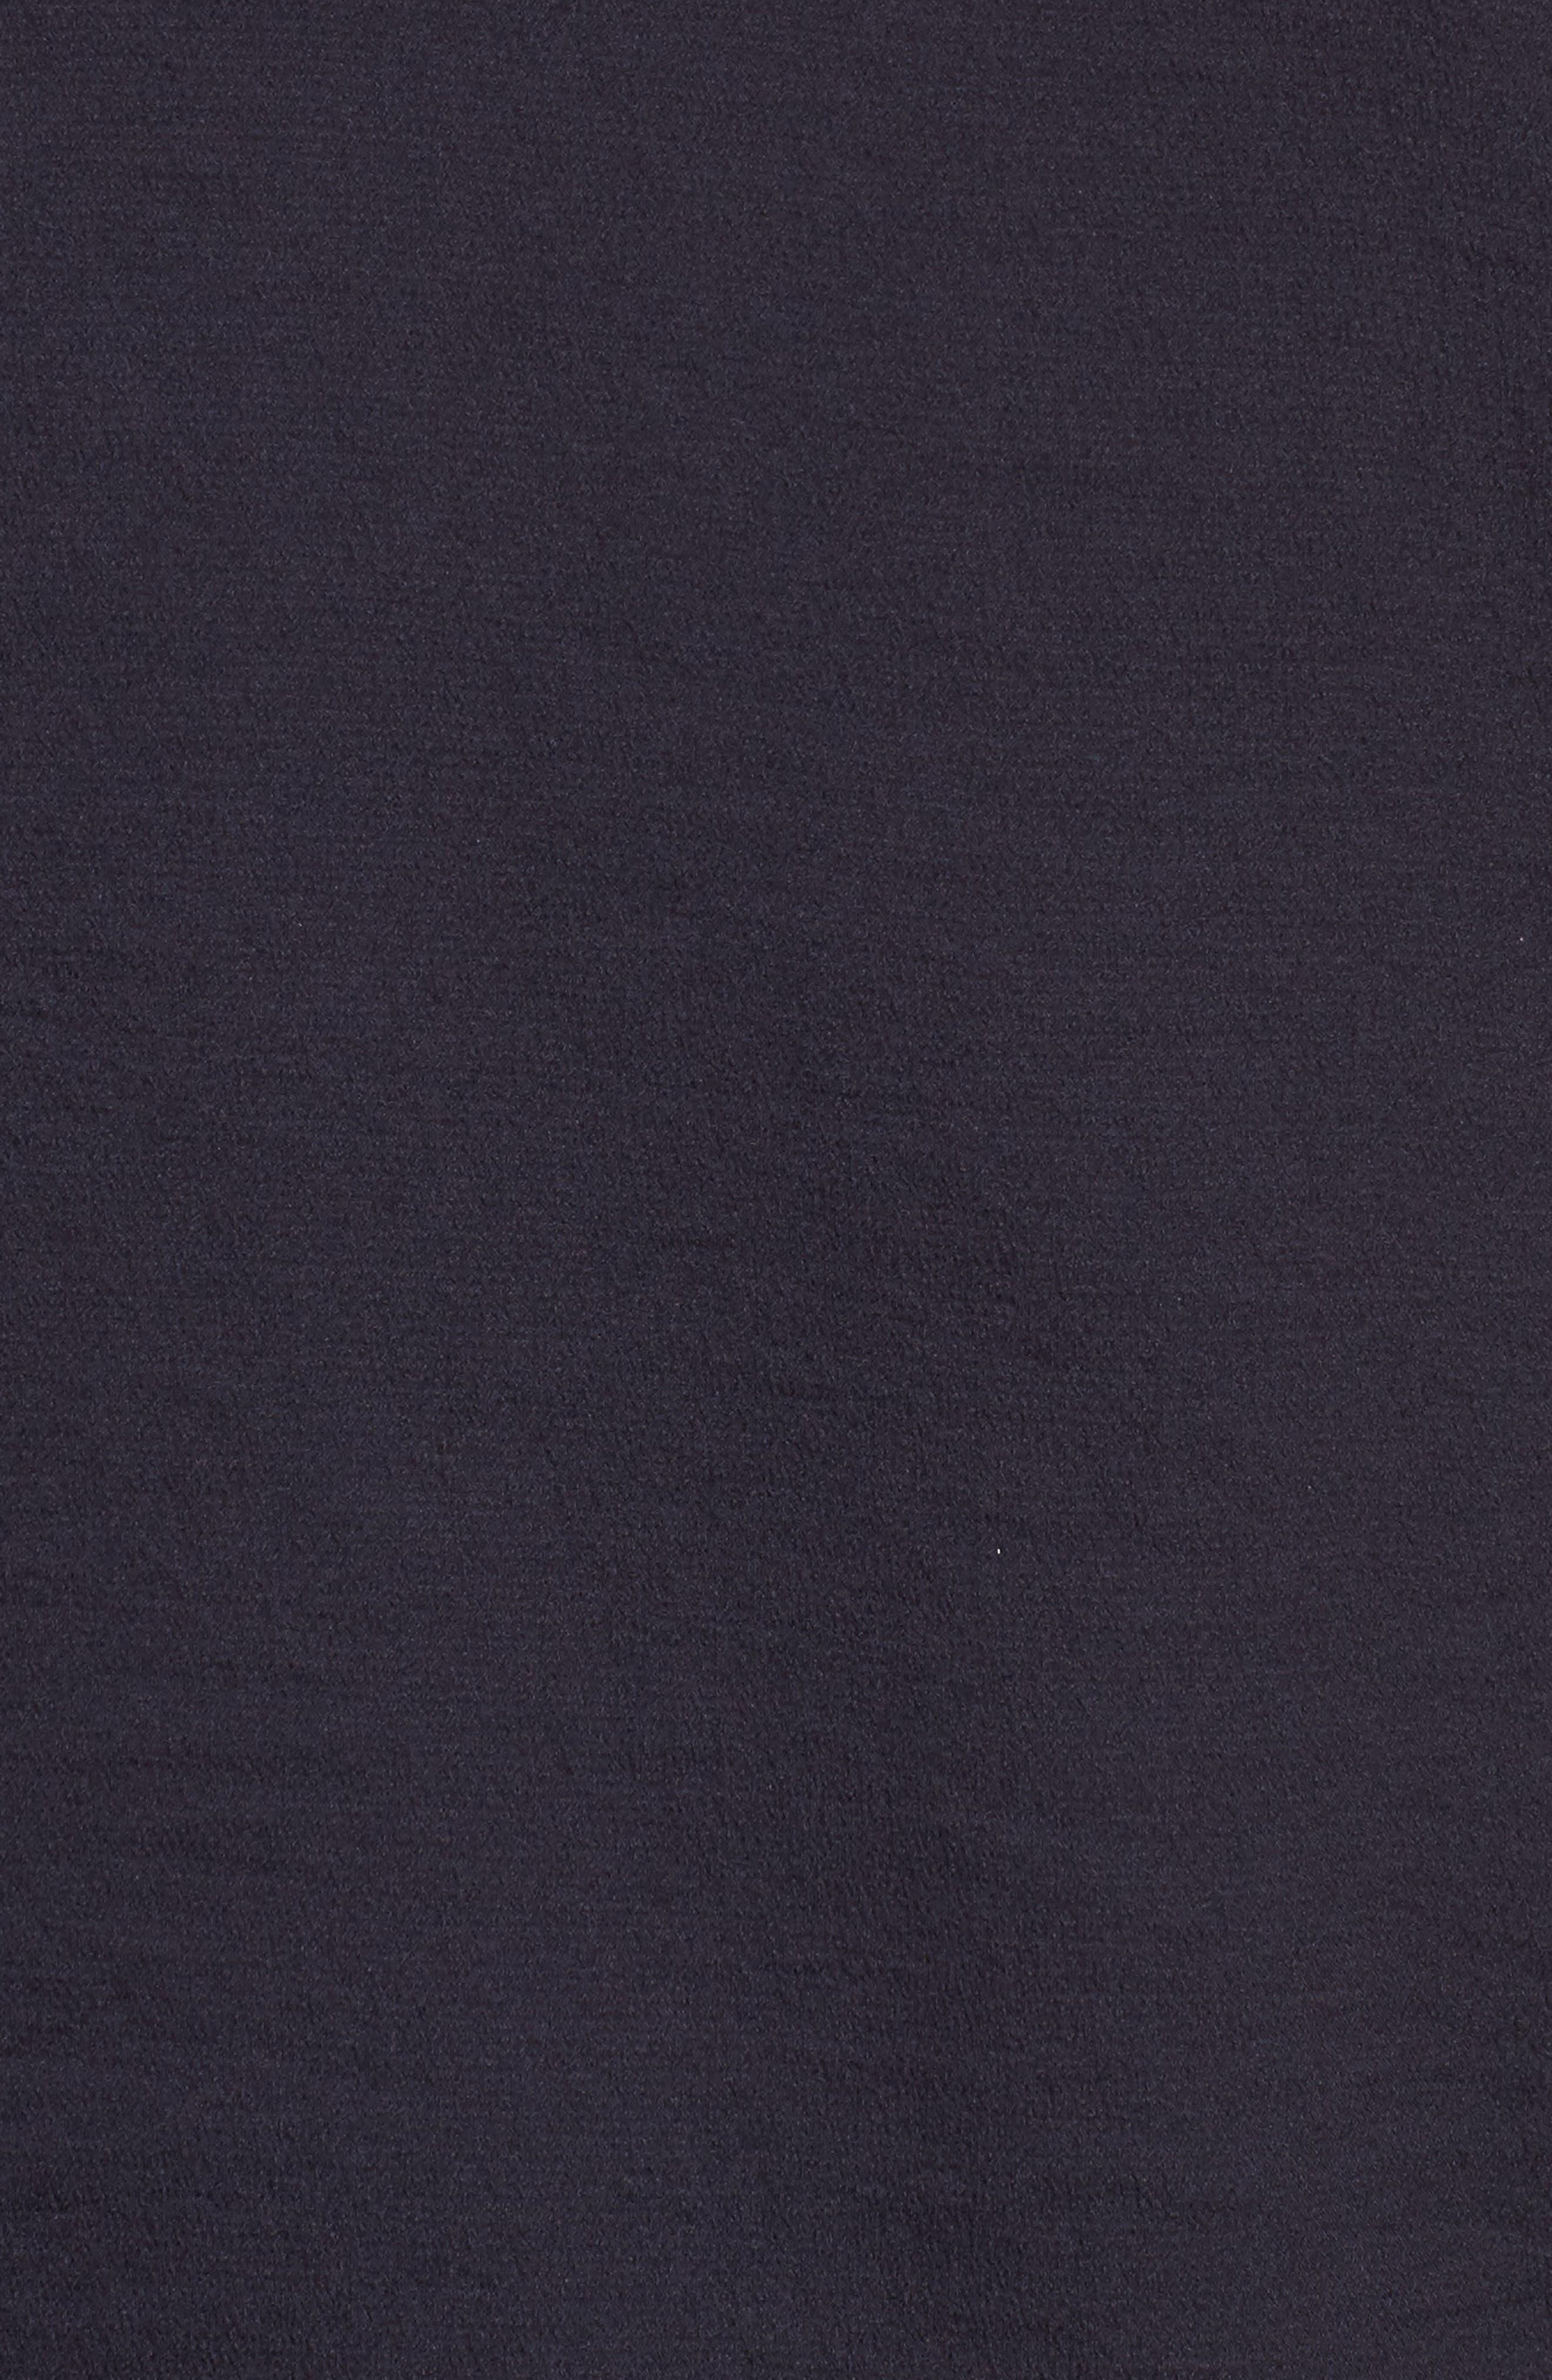 Ruffle Sleeve Top,                             Alternate thumbnail 5, color,                             410